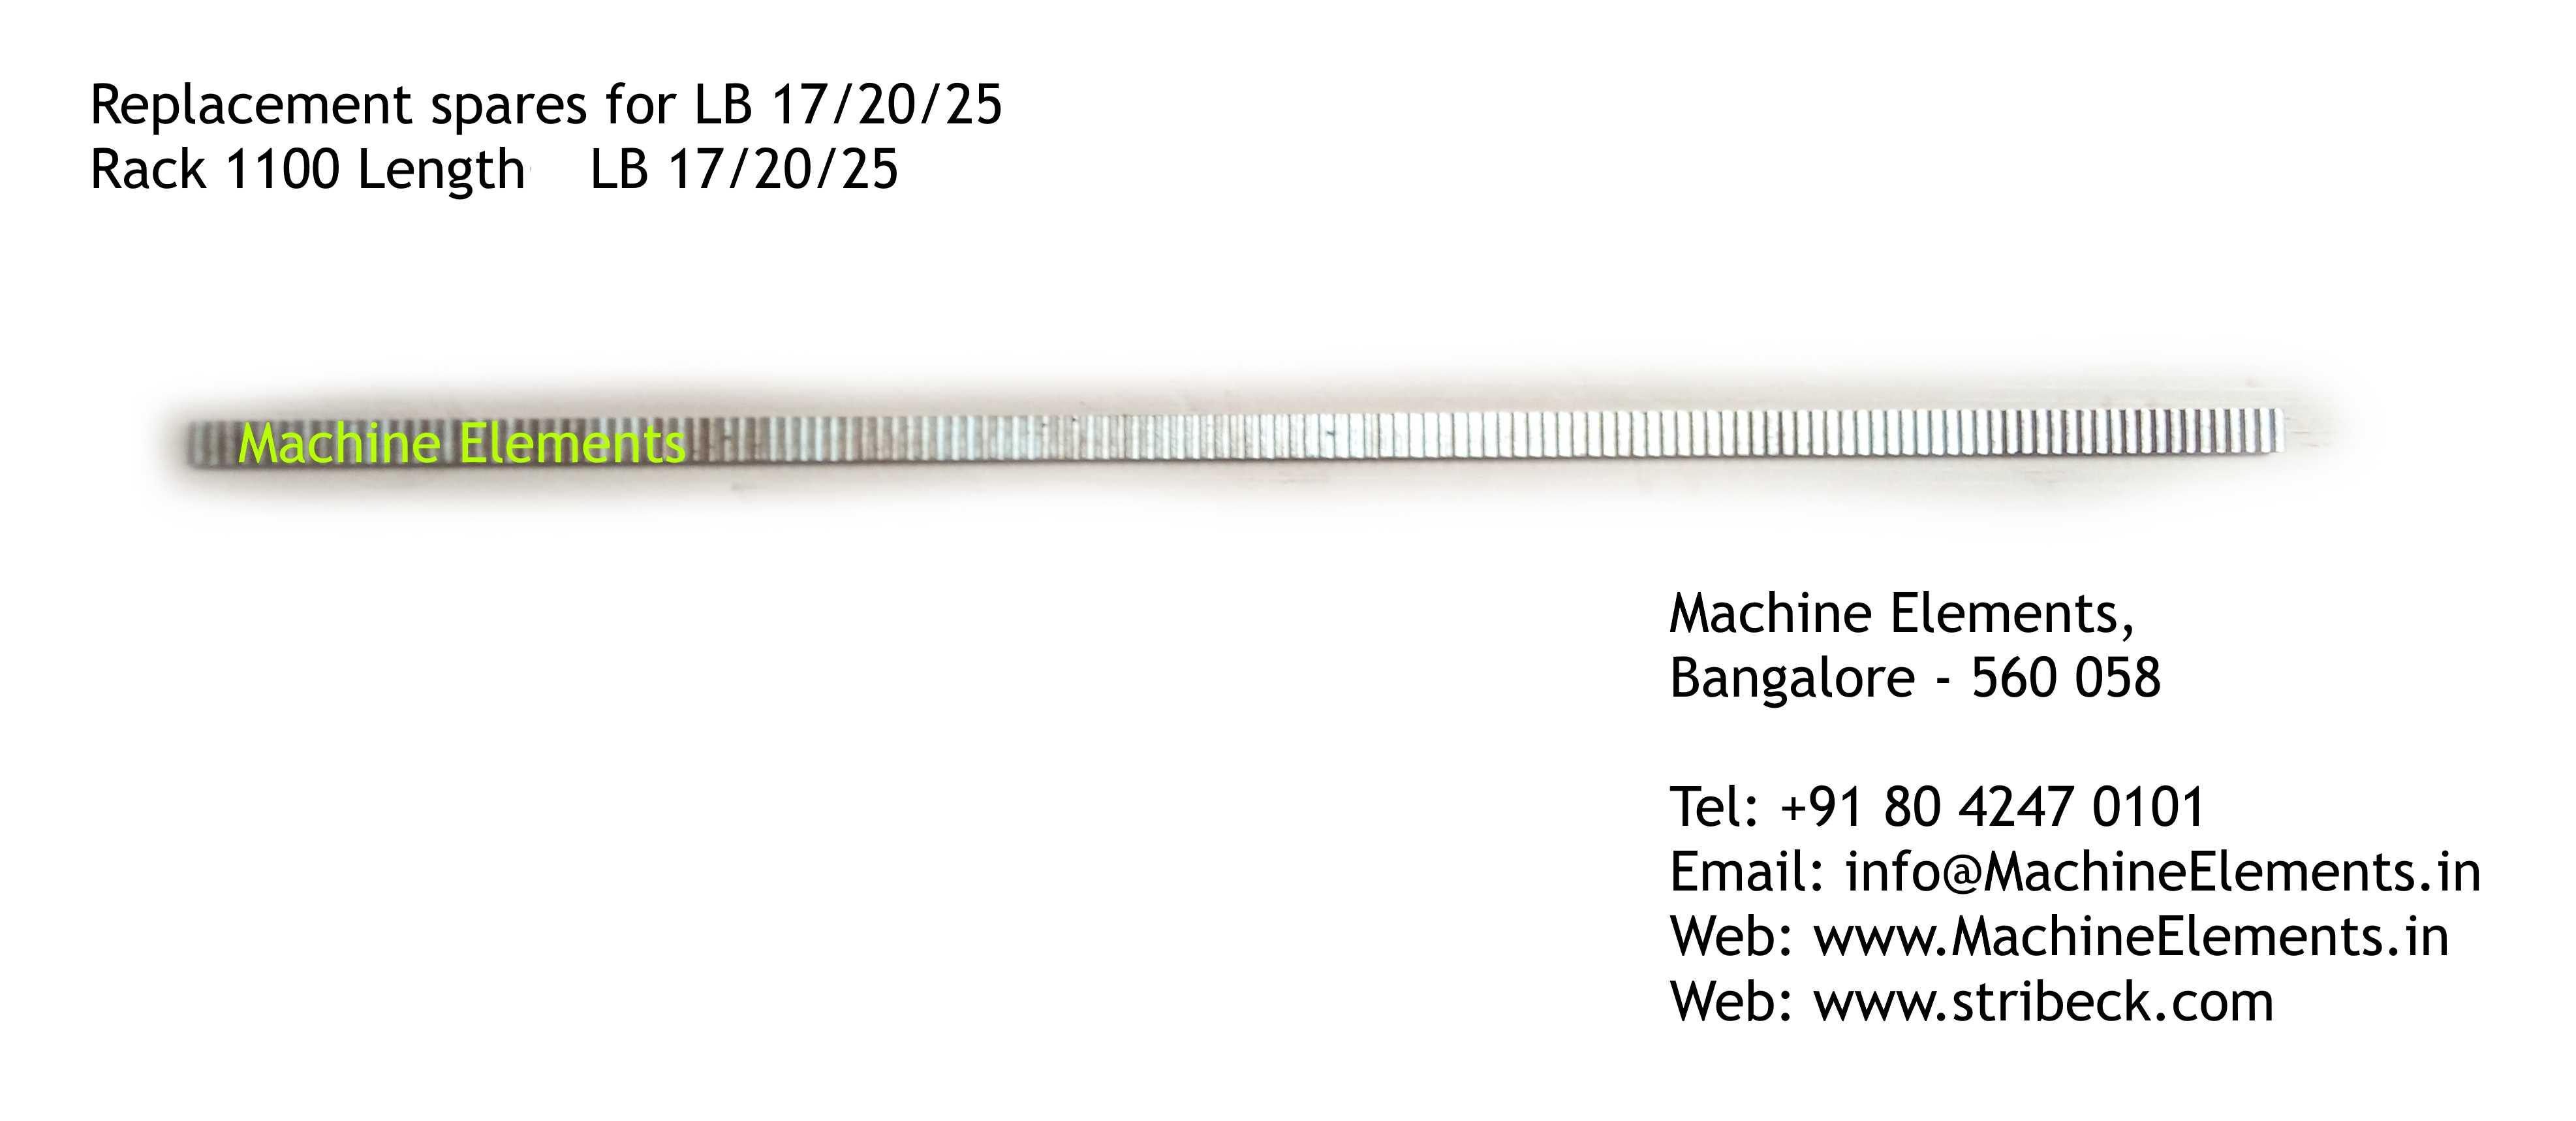 Rack 1100 Length